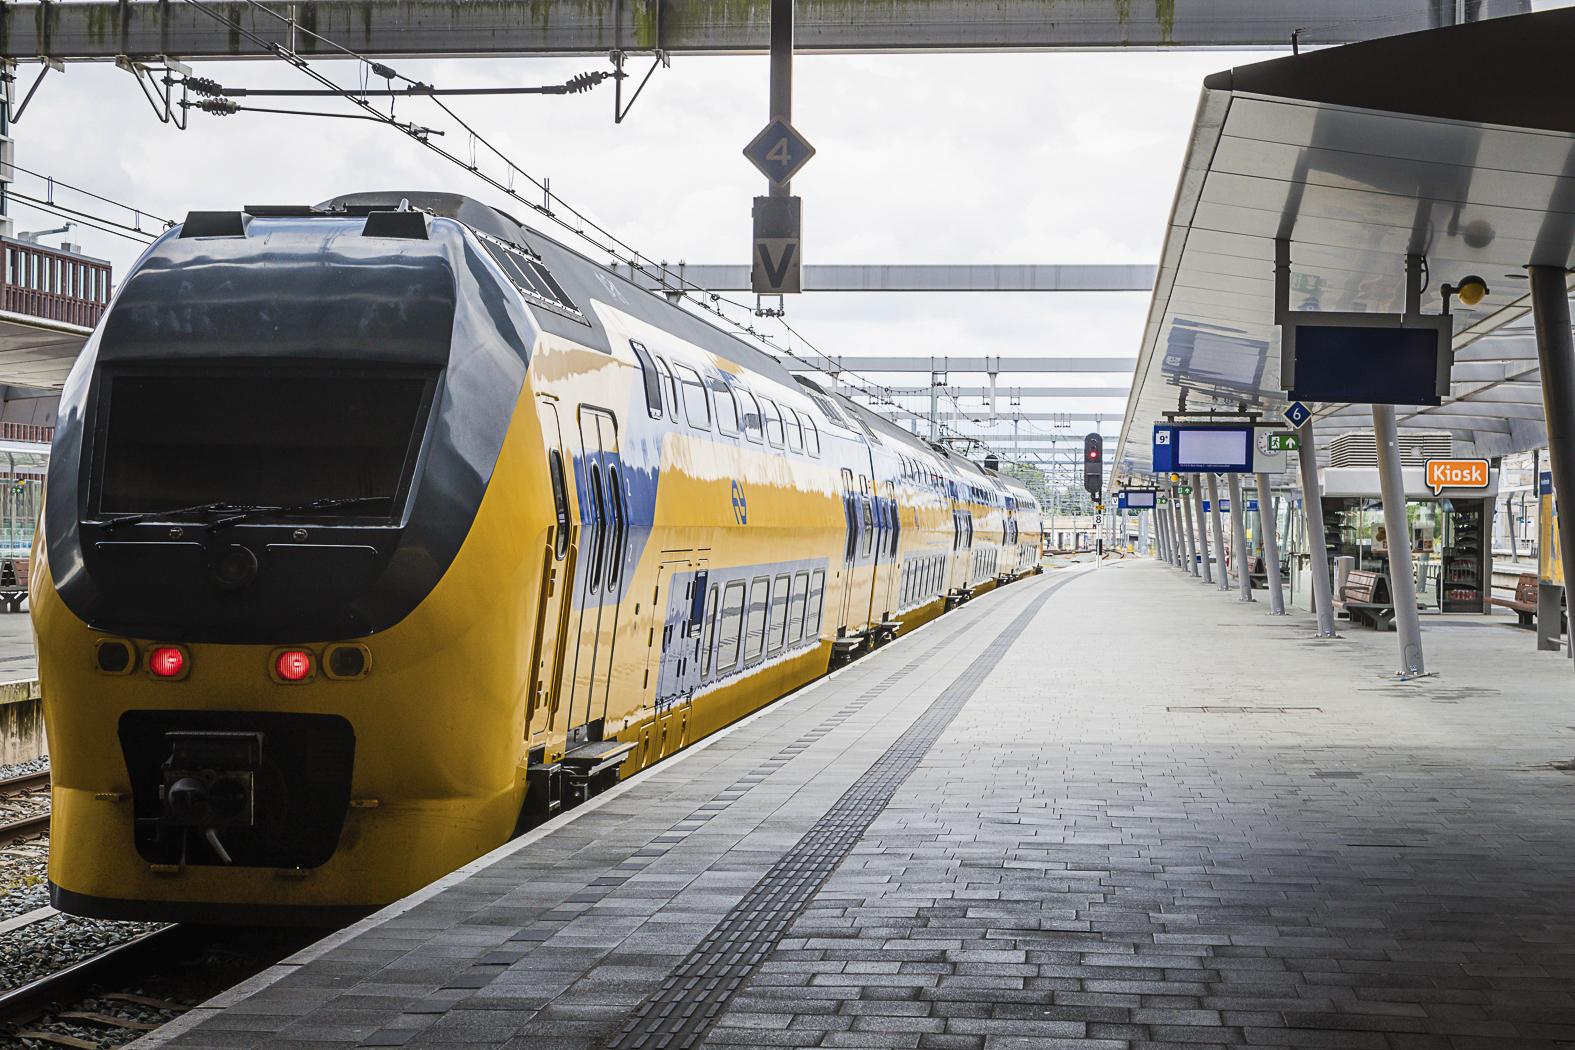 20190528-20190528-Station-Utrecht-CS-verlaten-12